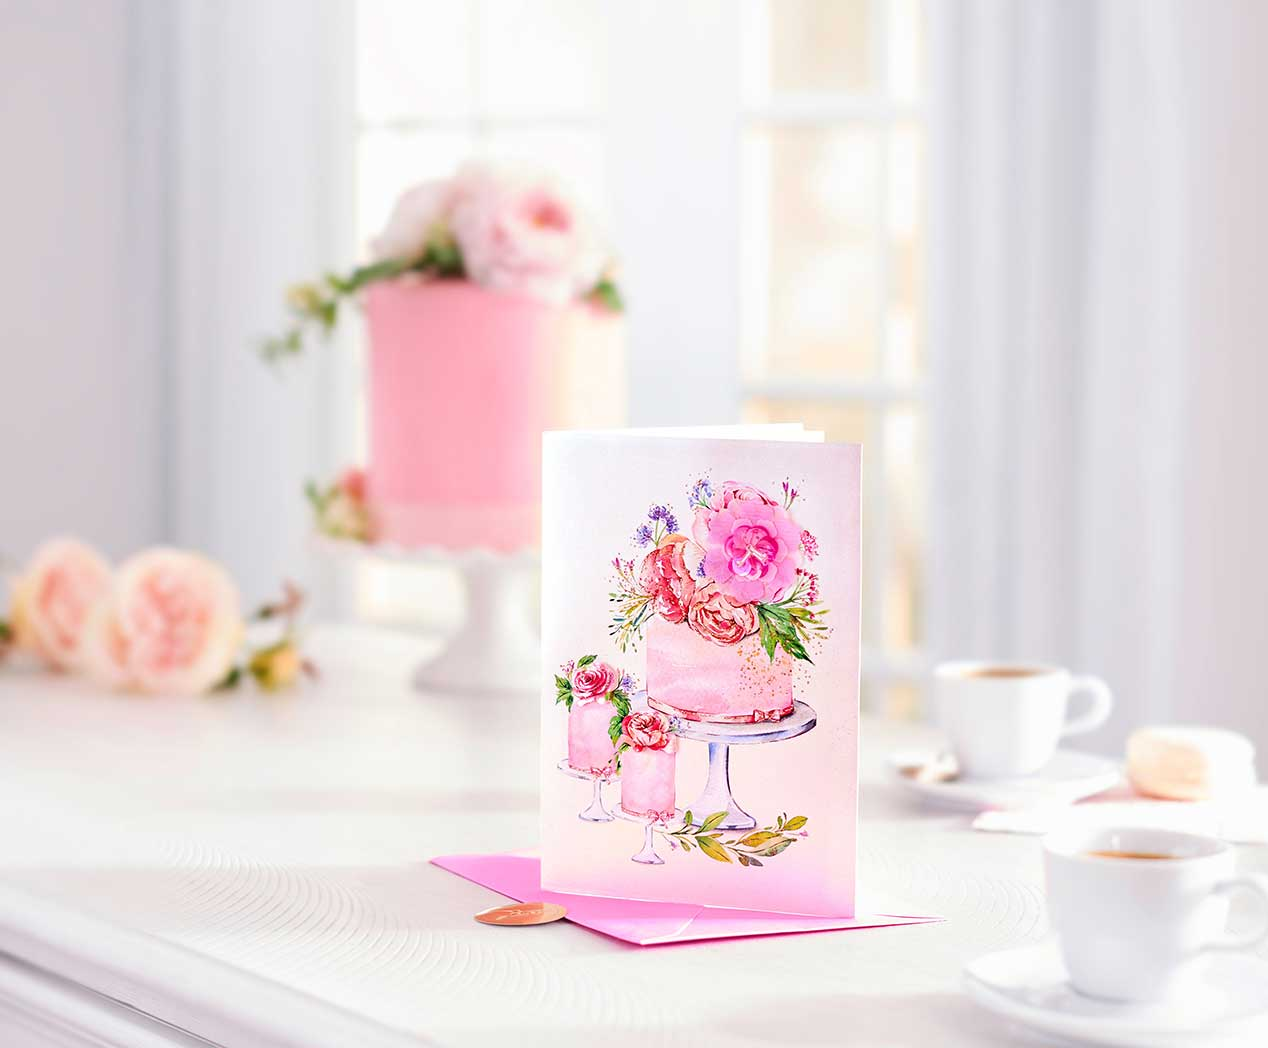 Pink-Cake-BD-BestRGB_sq---Hilary-Filipowicz.jpg